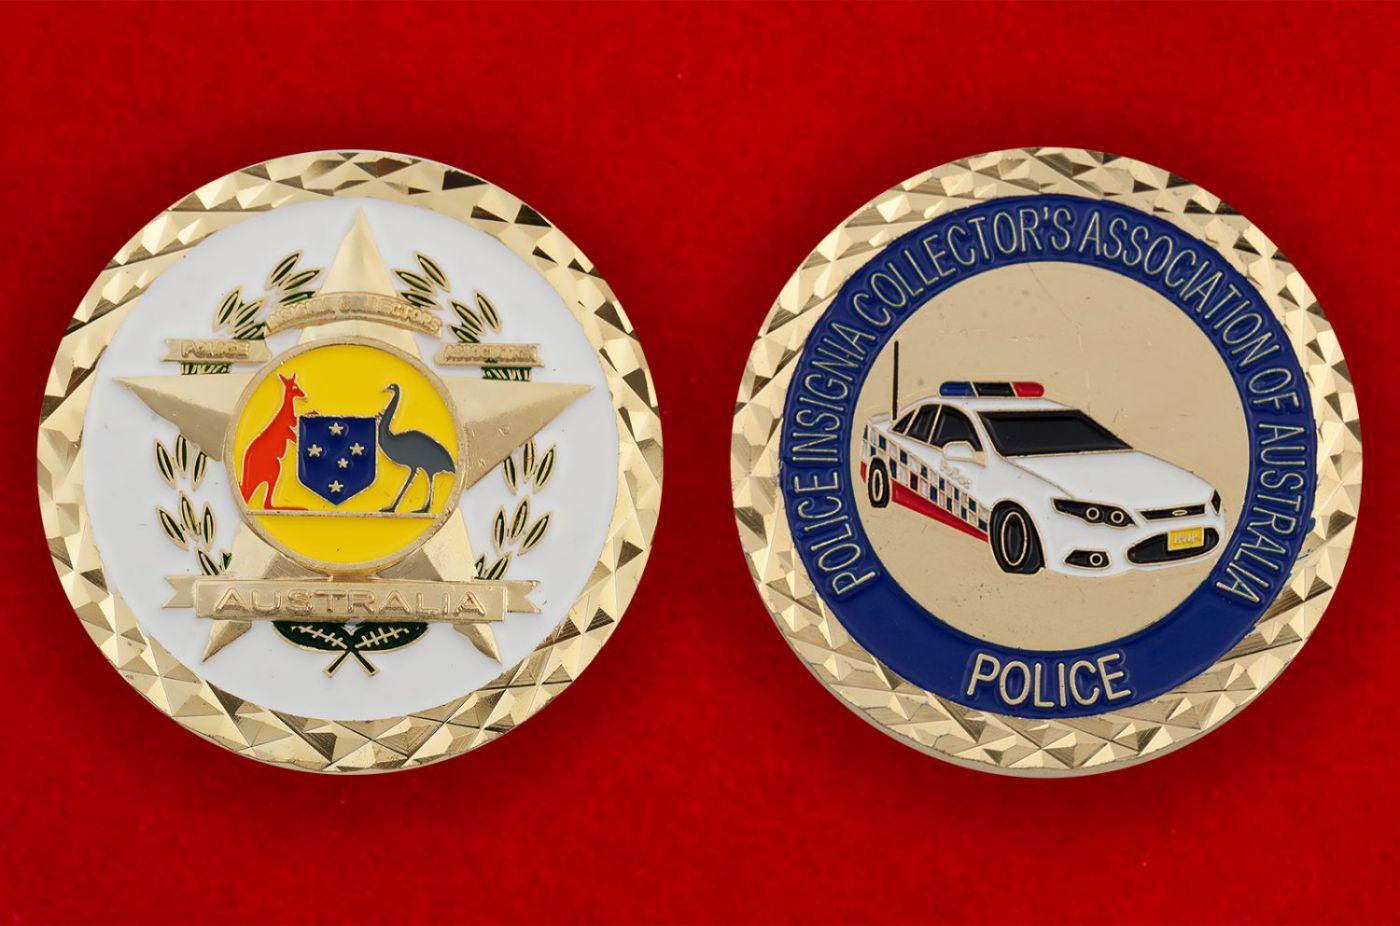 Челлендж коин полиции Австралии - аверс и реверс